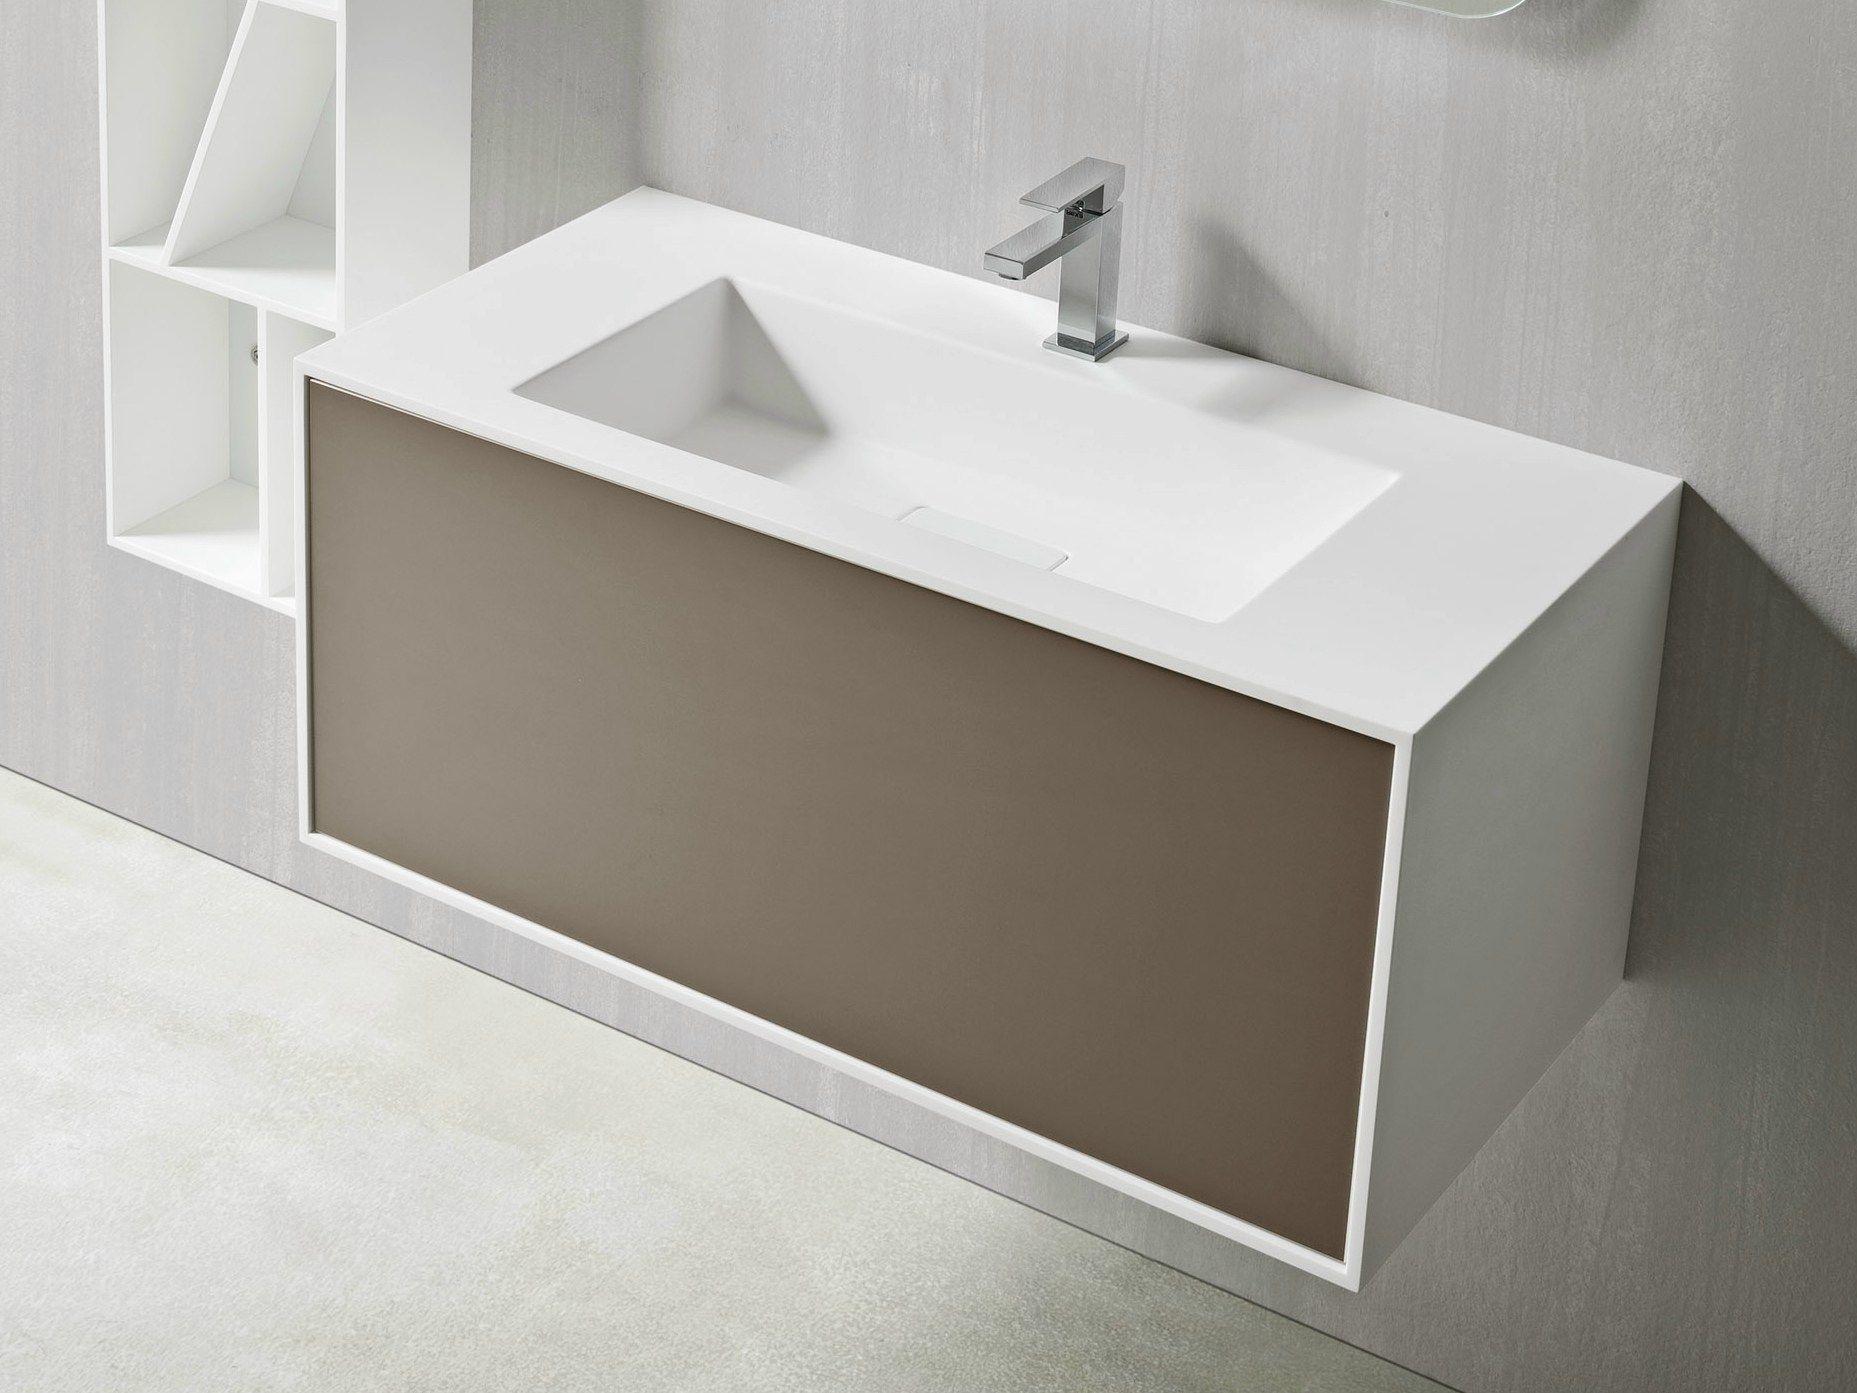 Giano Rectangular Washbasin By Rexa Design Design Imago Design